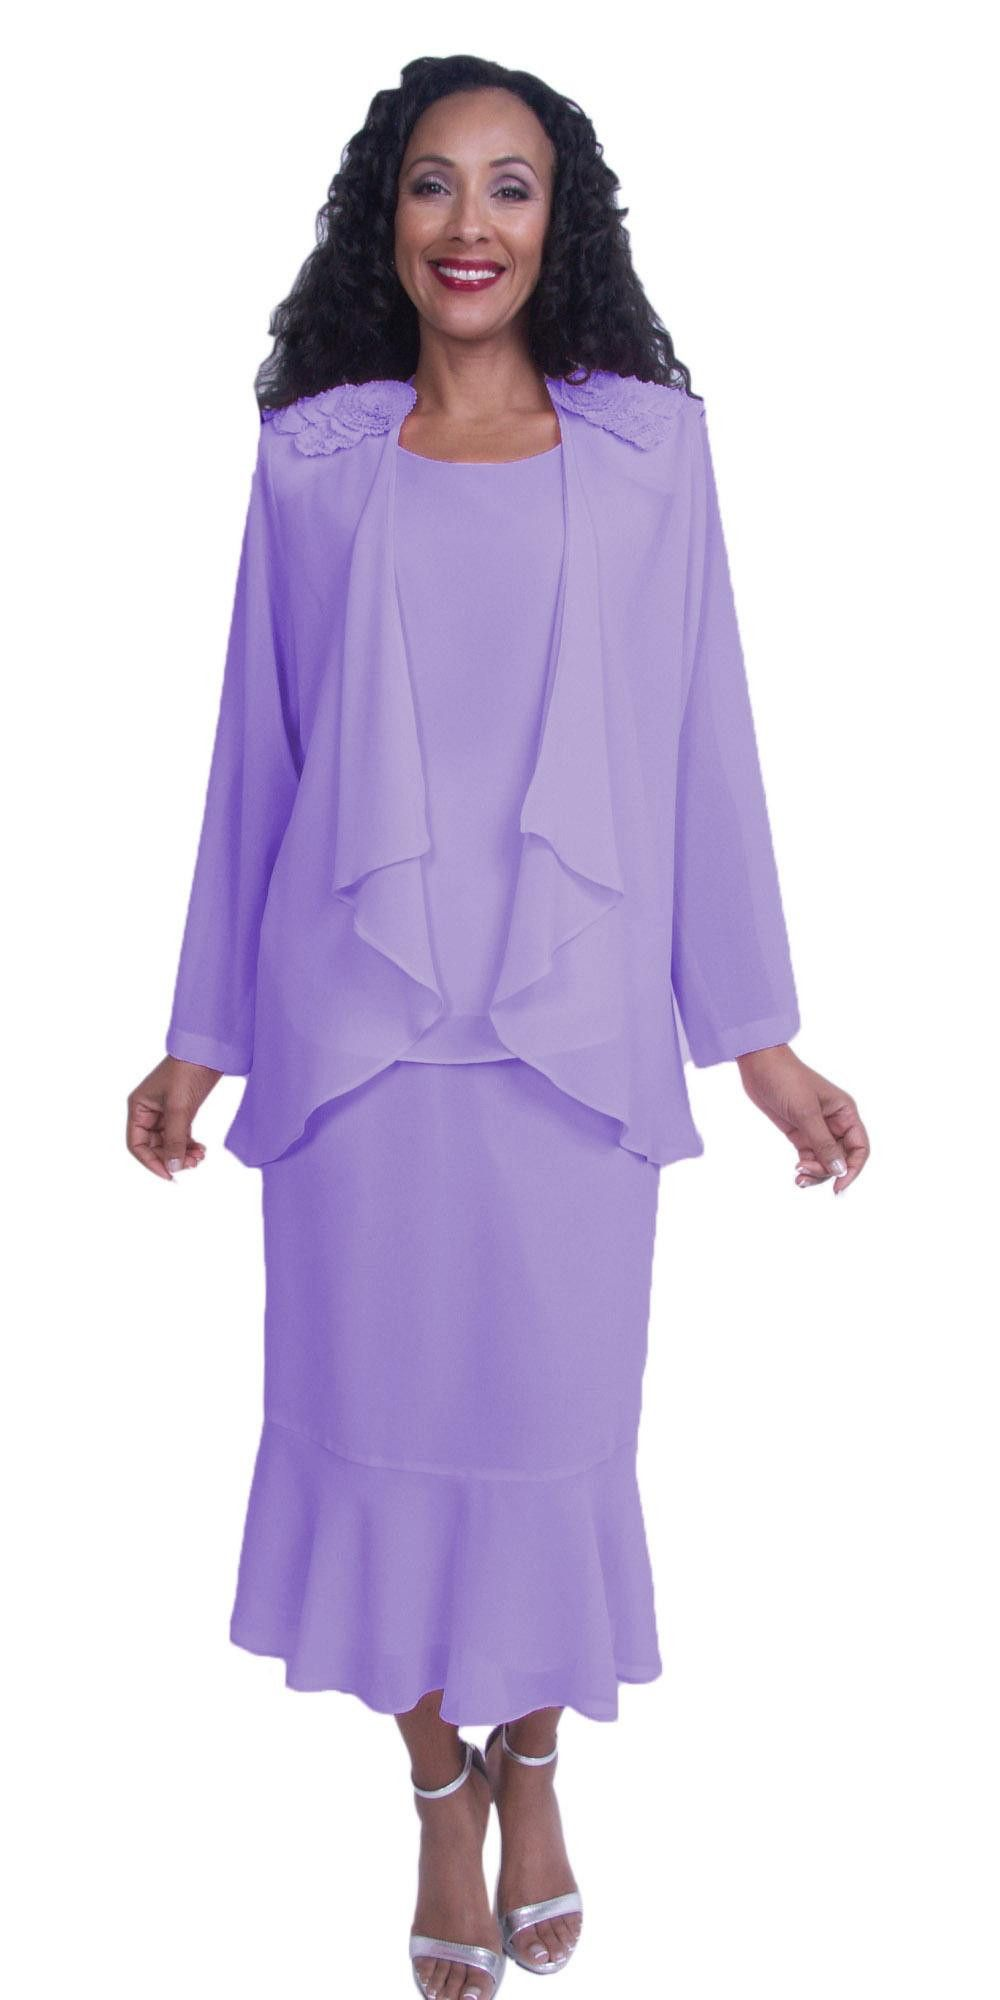 Hosanna 3830 - Plus Size Tea Length Dress White 3 Piece Set ...